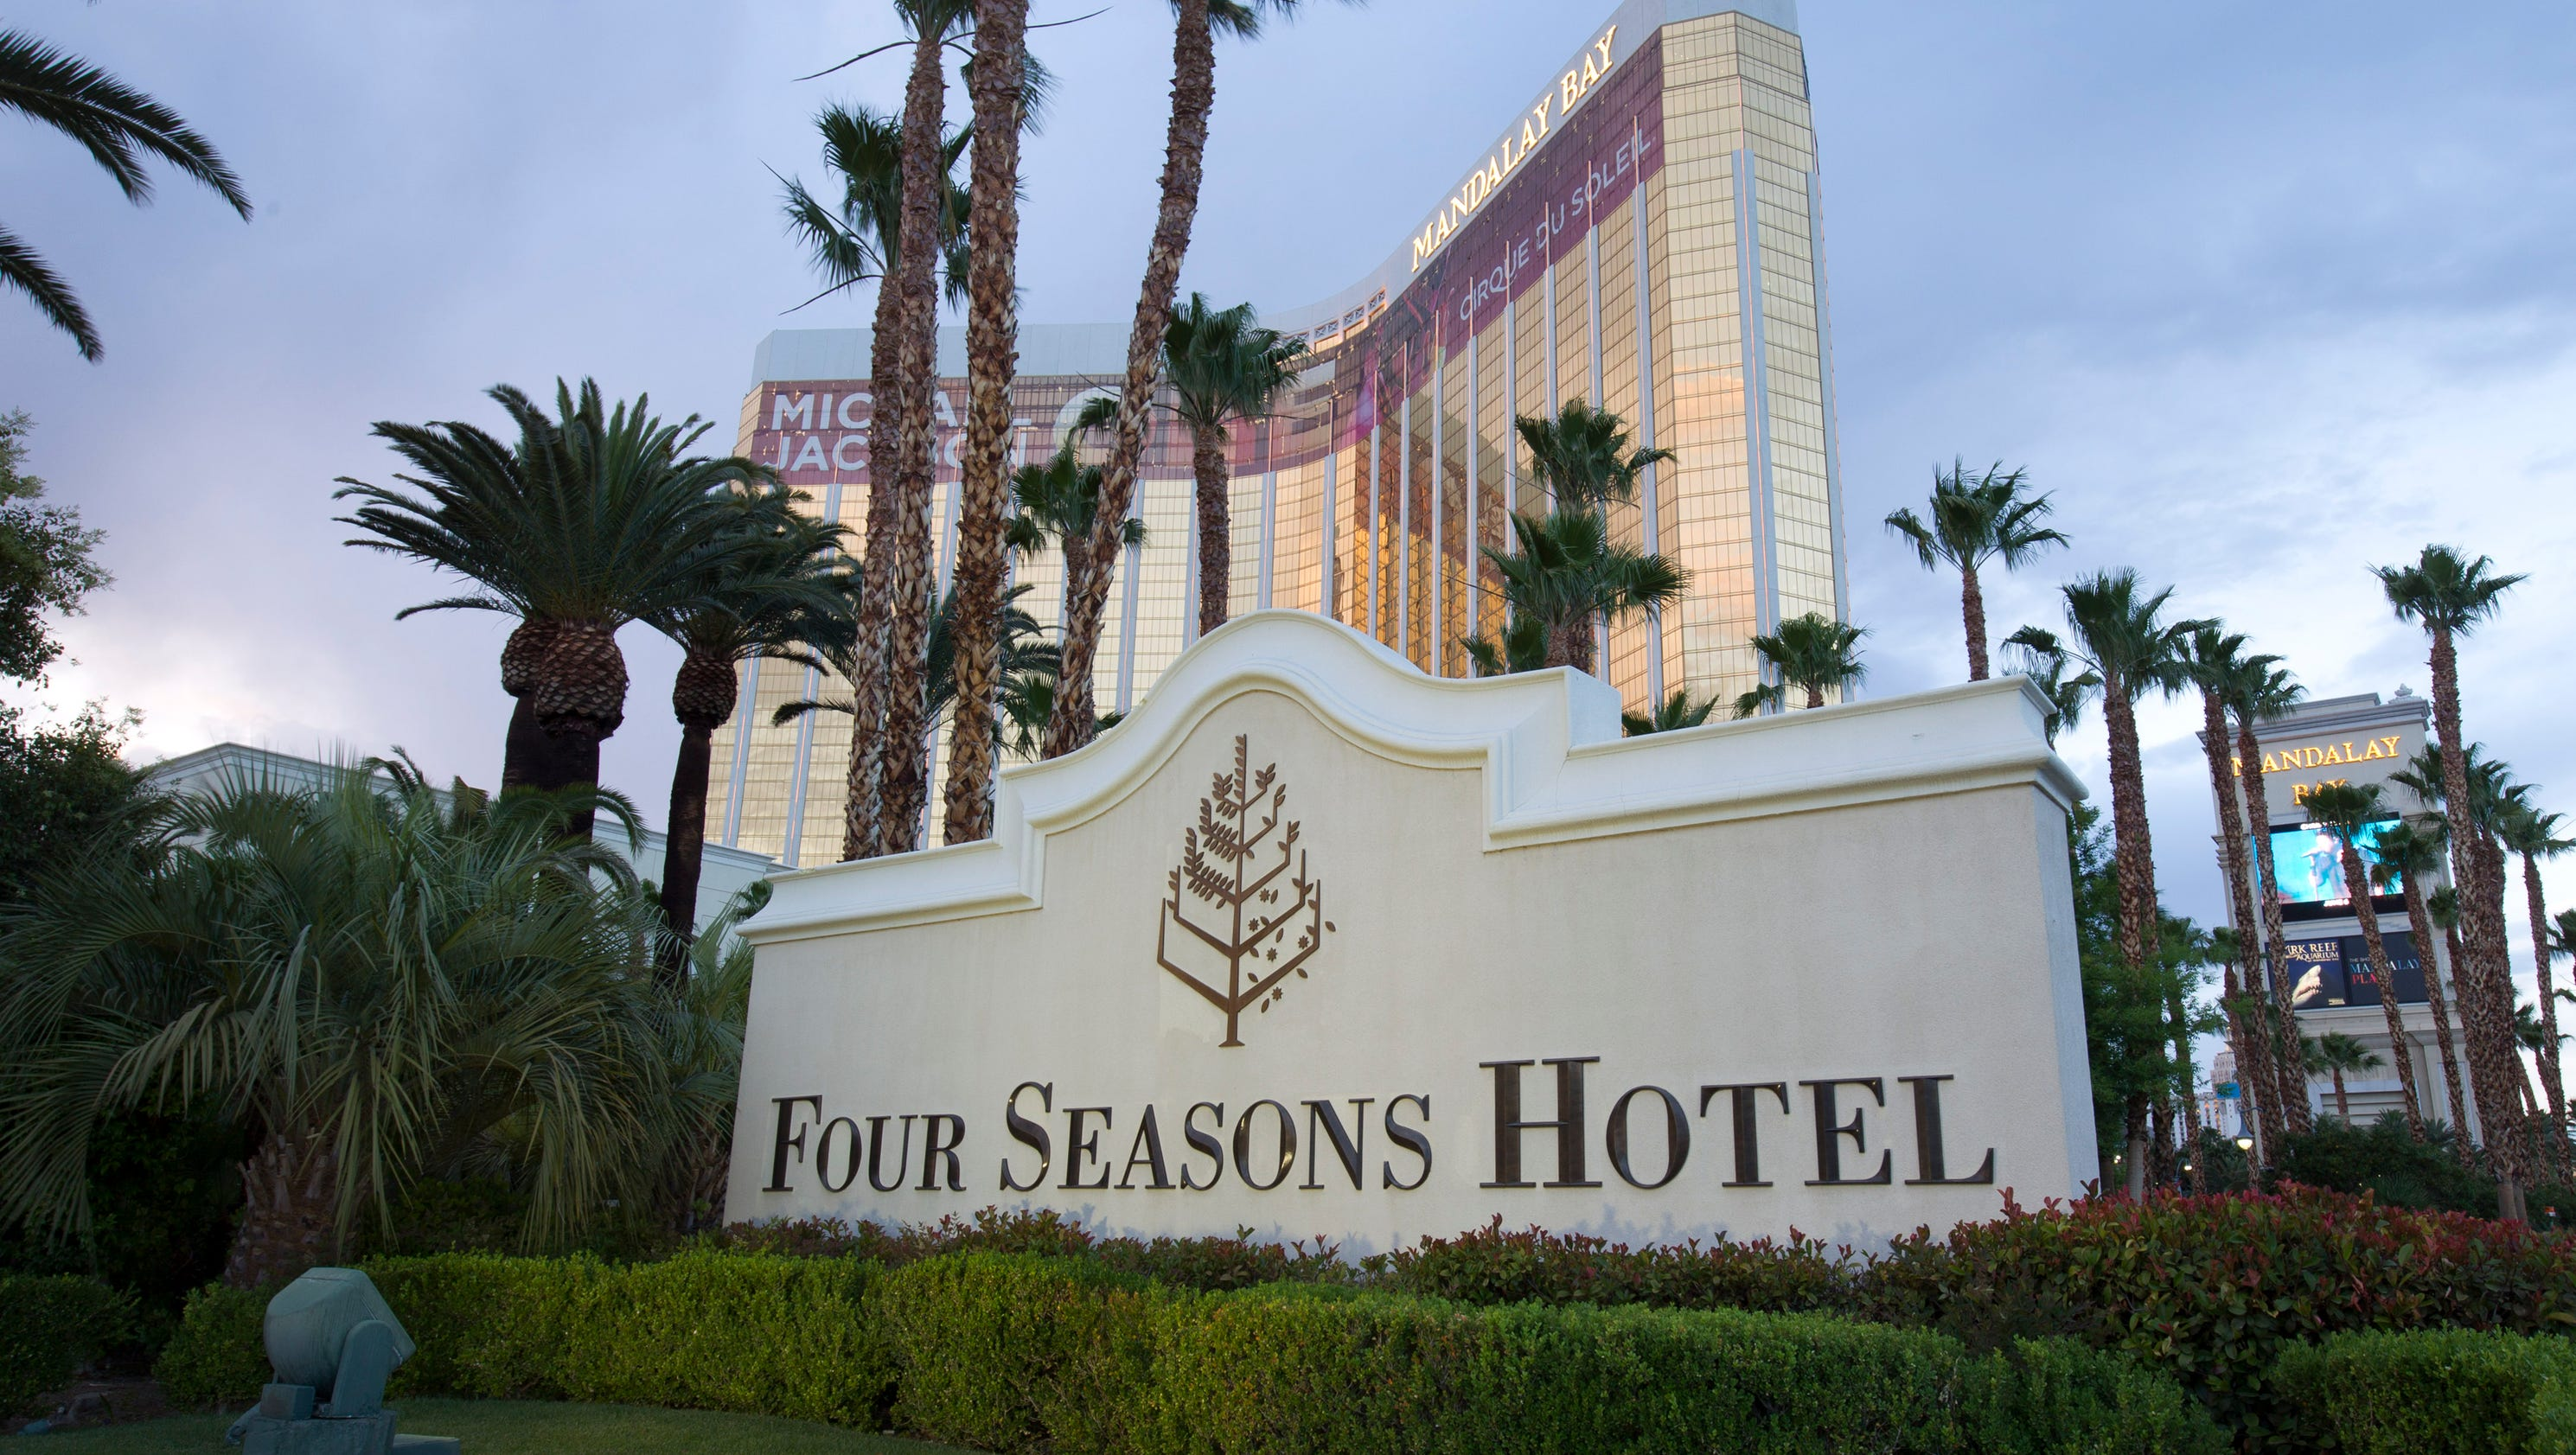 Four seasons hotel las vegas for Fourseason hotel